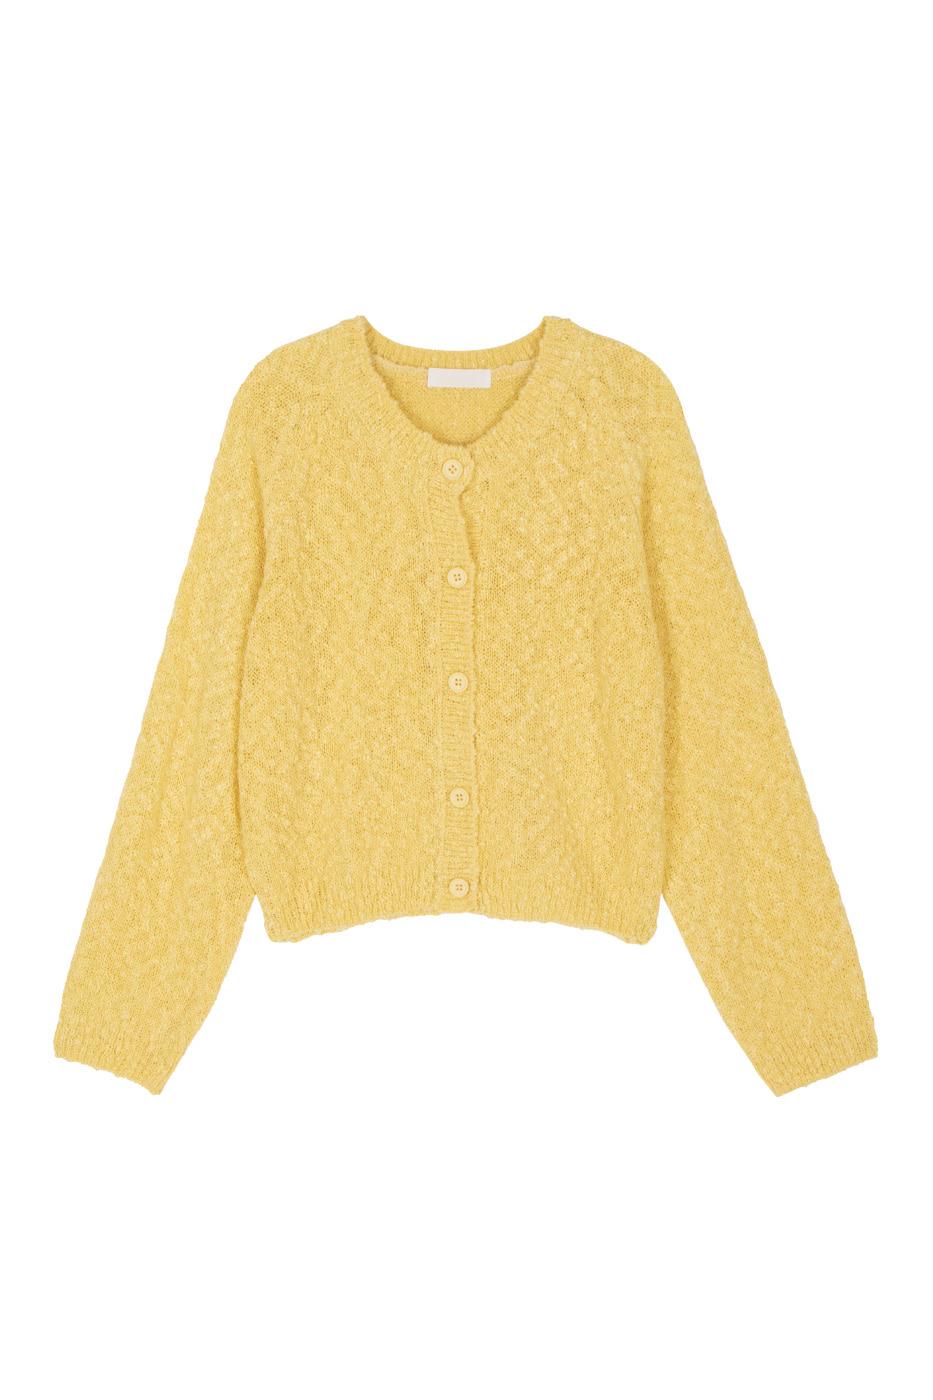 Slime Booklet Knitwear Cardigan